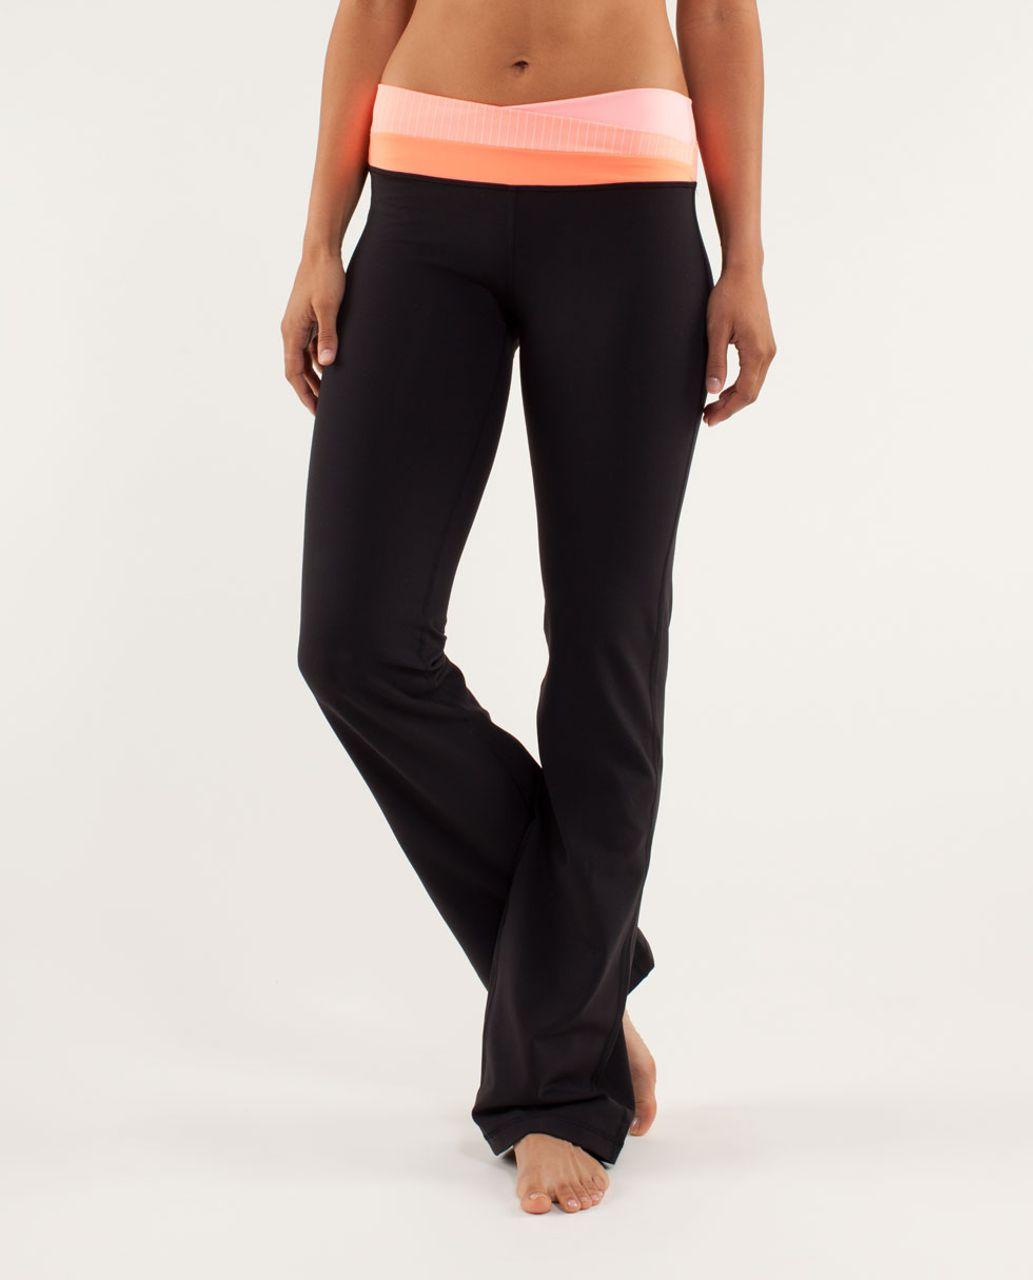 8769e1de4e Lululemon Astro Pant (Tall) - Black / Bleached Coral / Pop Orange - lulu  fanatics